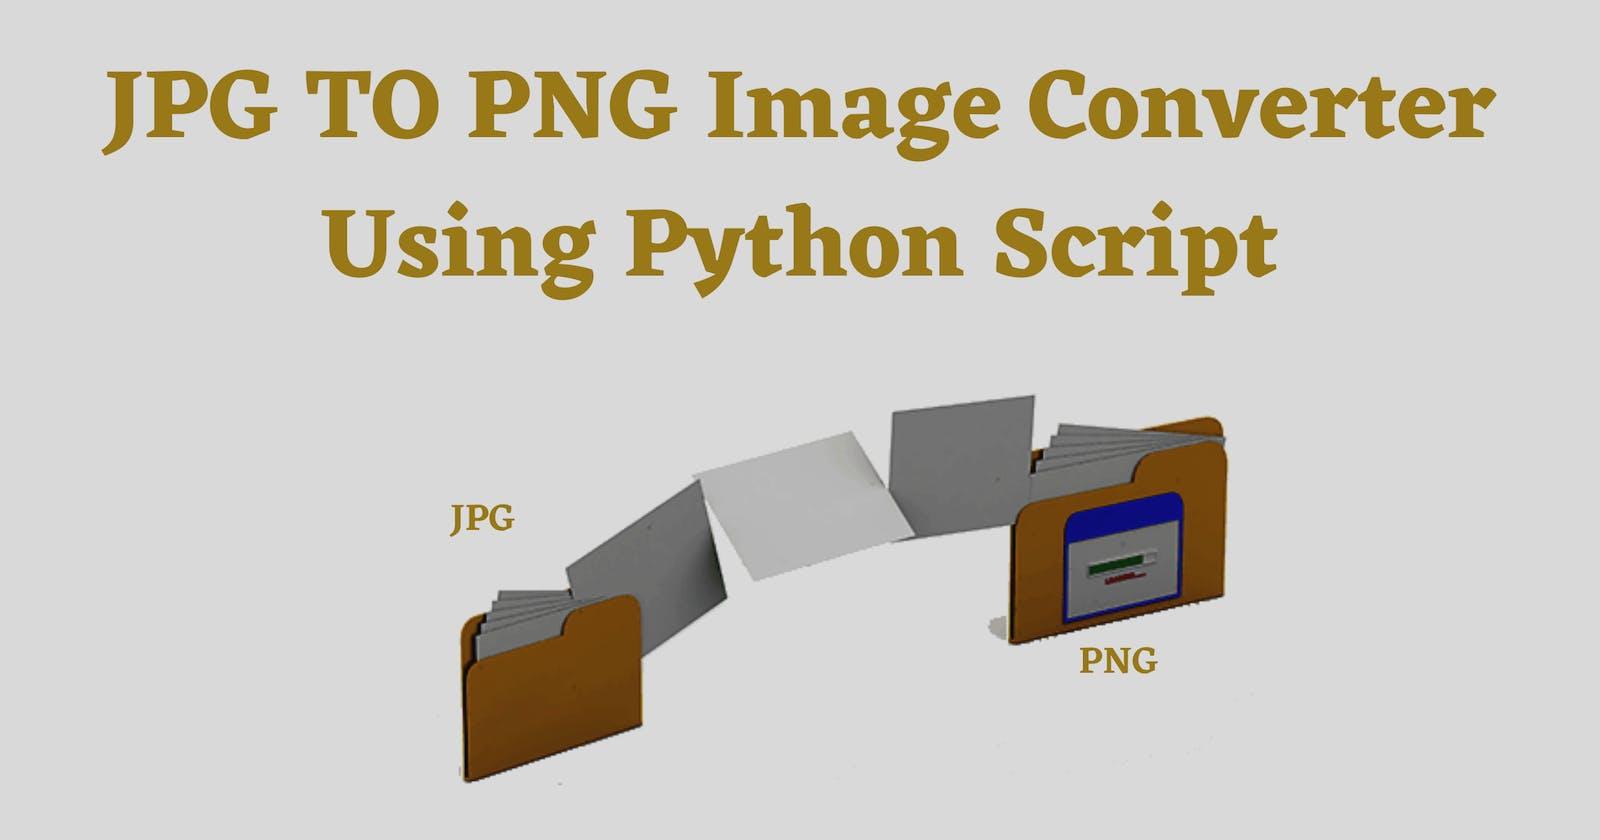 JPG To PNG Image Converter Using Python Script